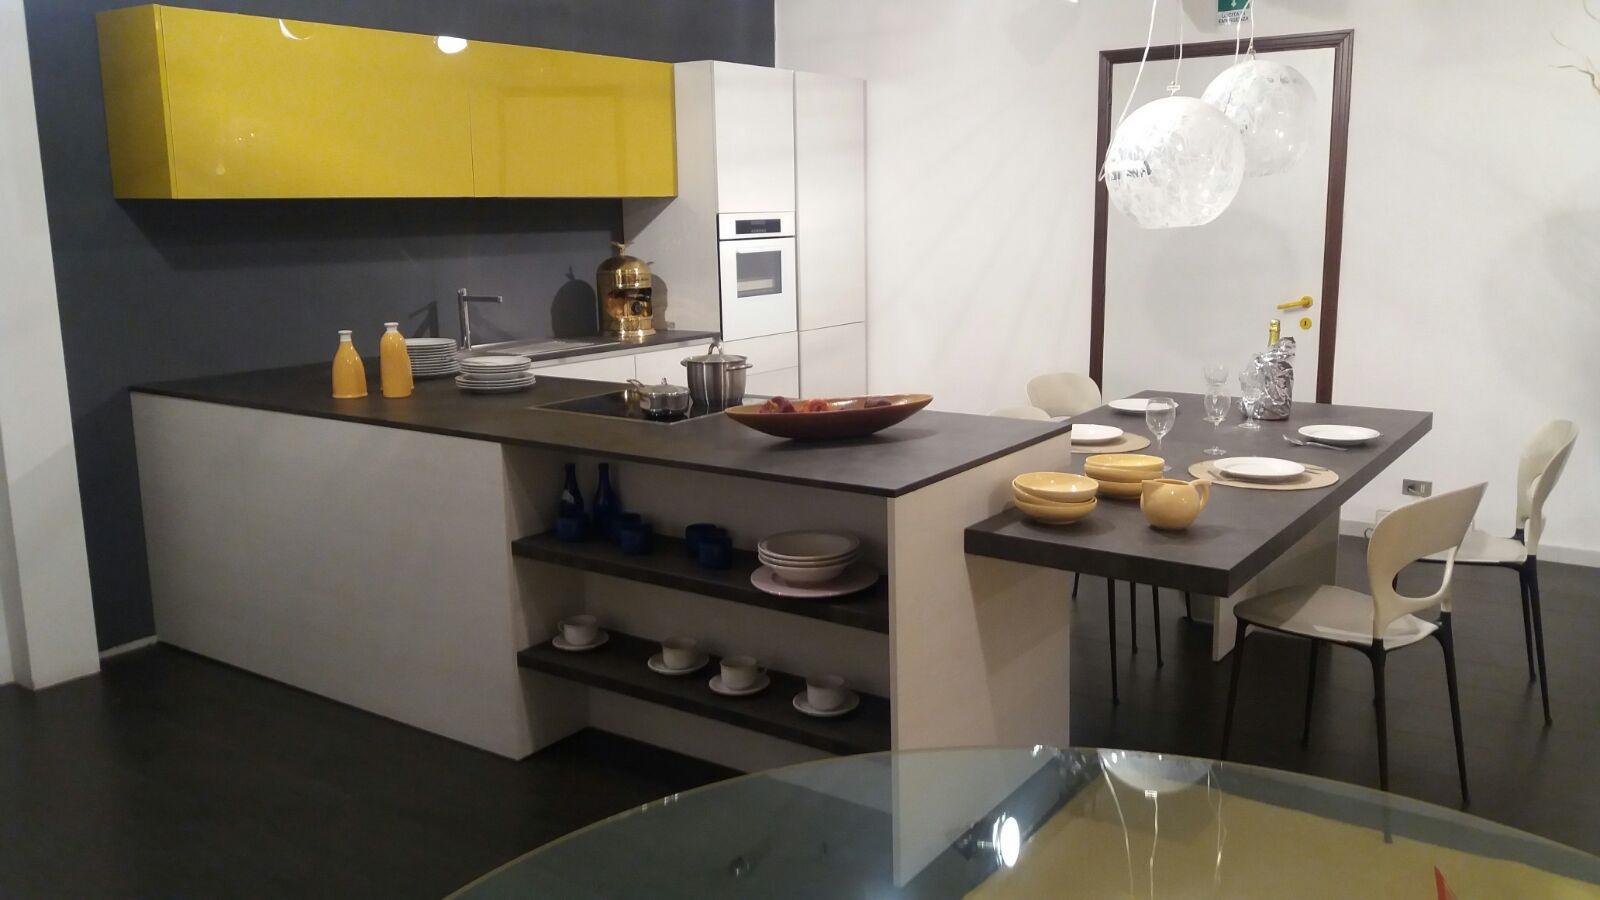 Moduli per cucina componibile finest awesome moduli cucine componibili gallery home design - Moduli per cucine componibili ...